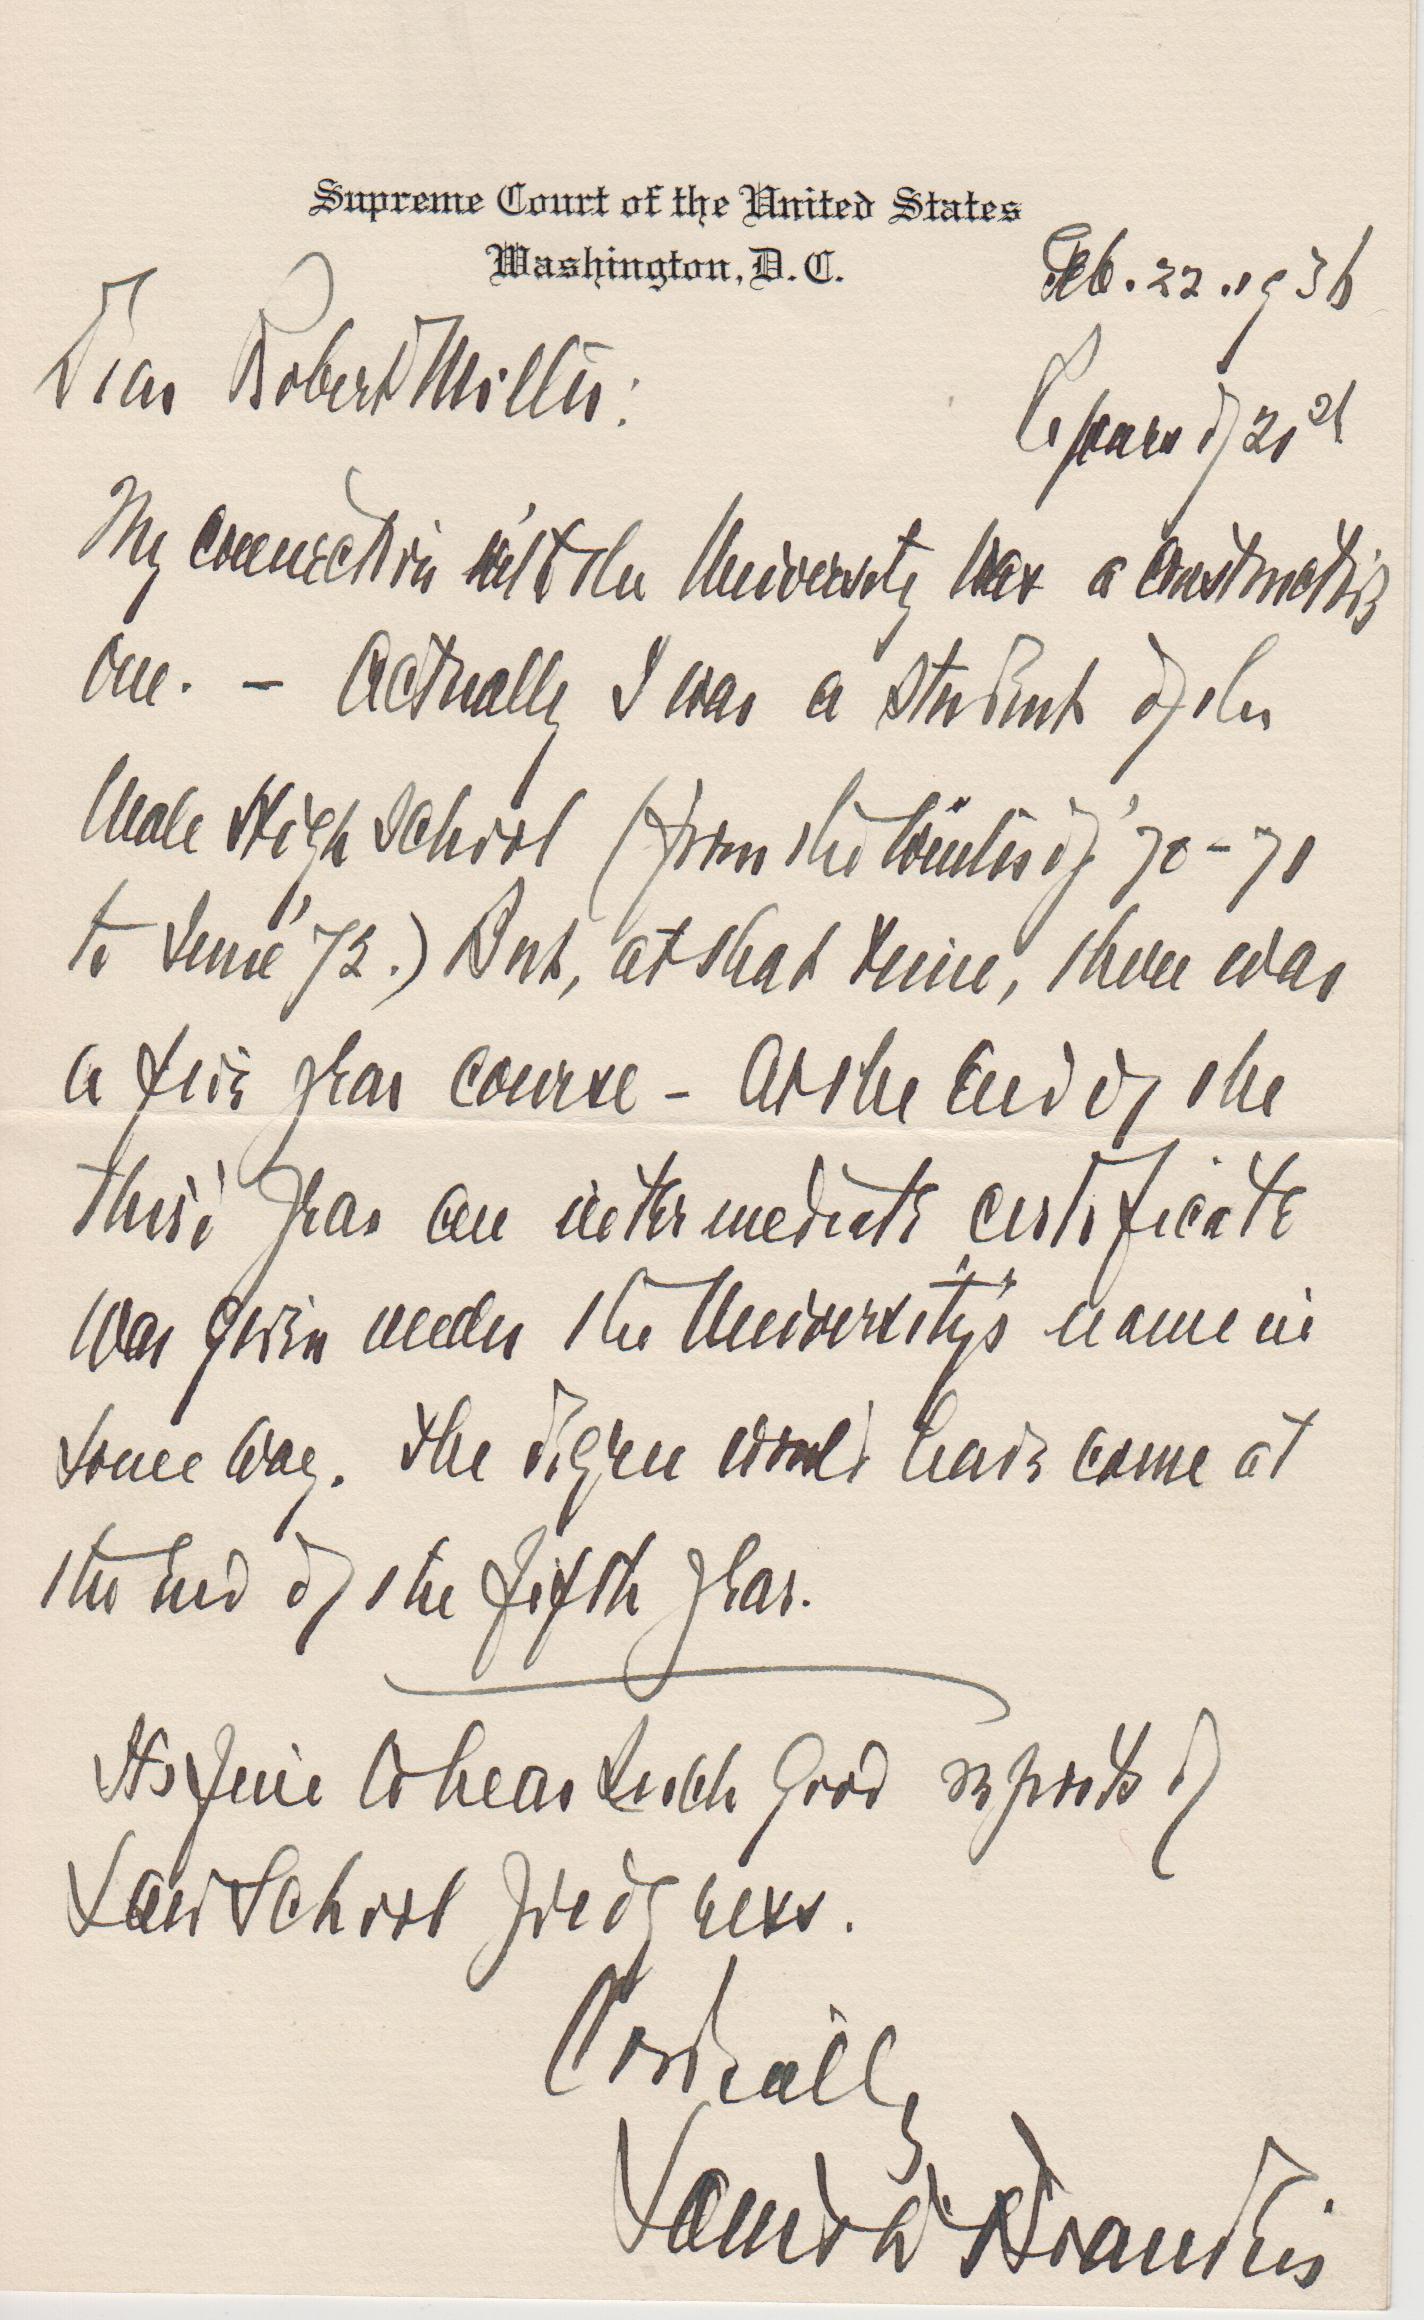 Was louis d brandeis a university of louisville alumnus february 22 1936 letter from louis d brandeis to robert miller aljukfo Image collections